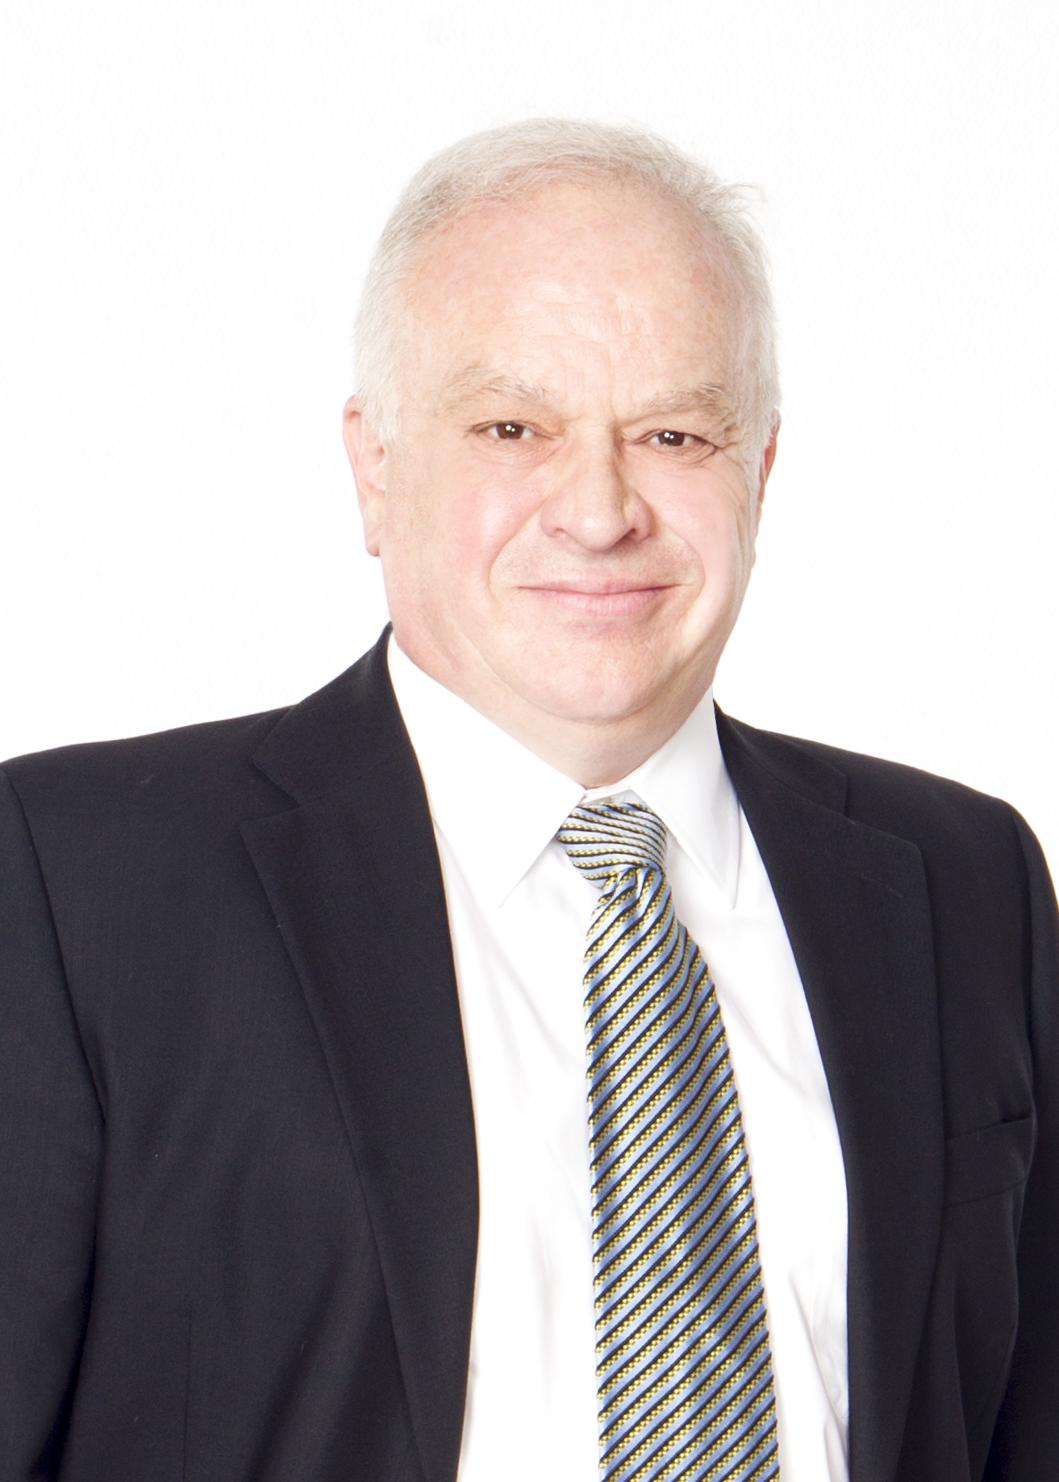 Portrait of Bob Luckhart